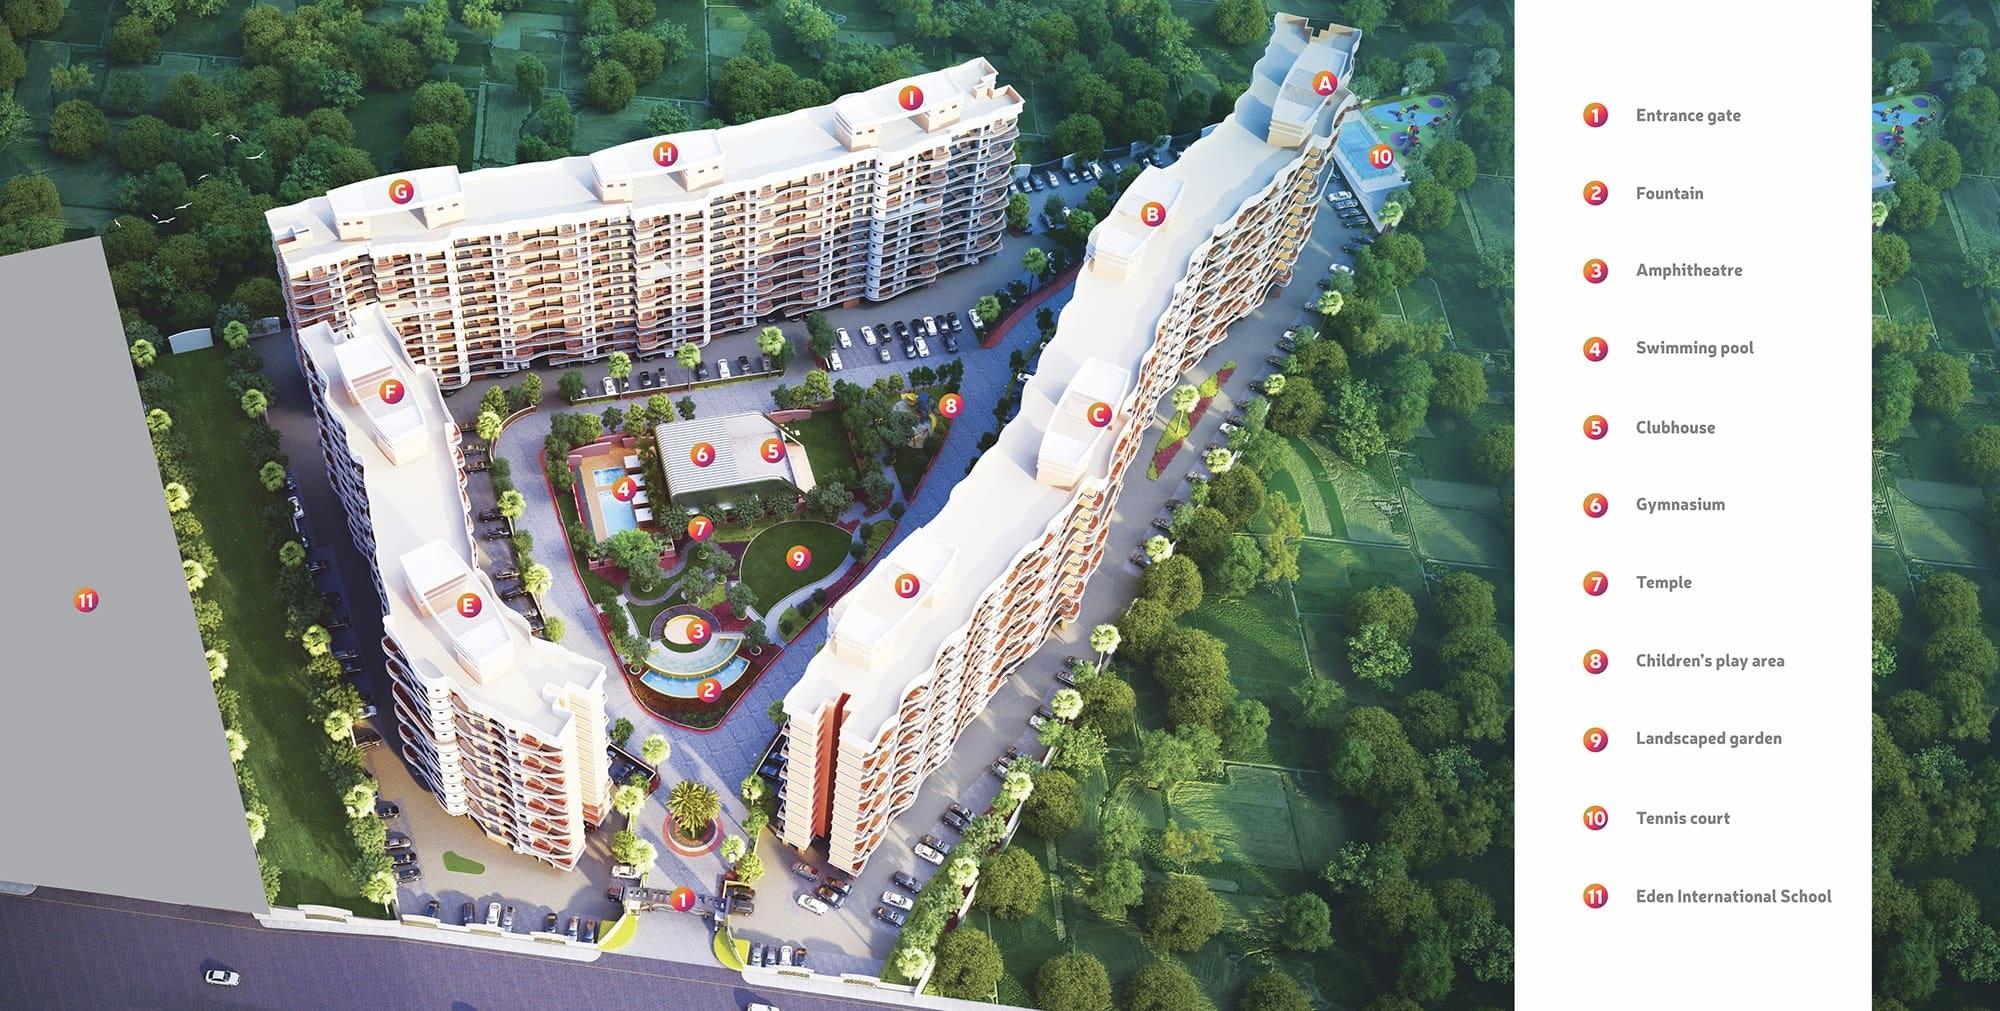 vtp urban life project master plan image1